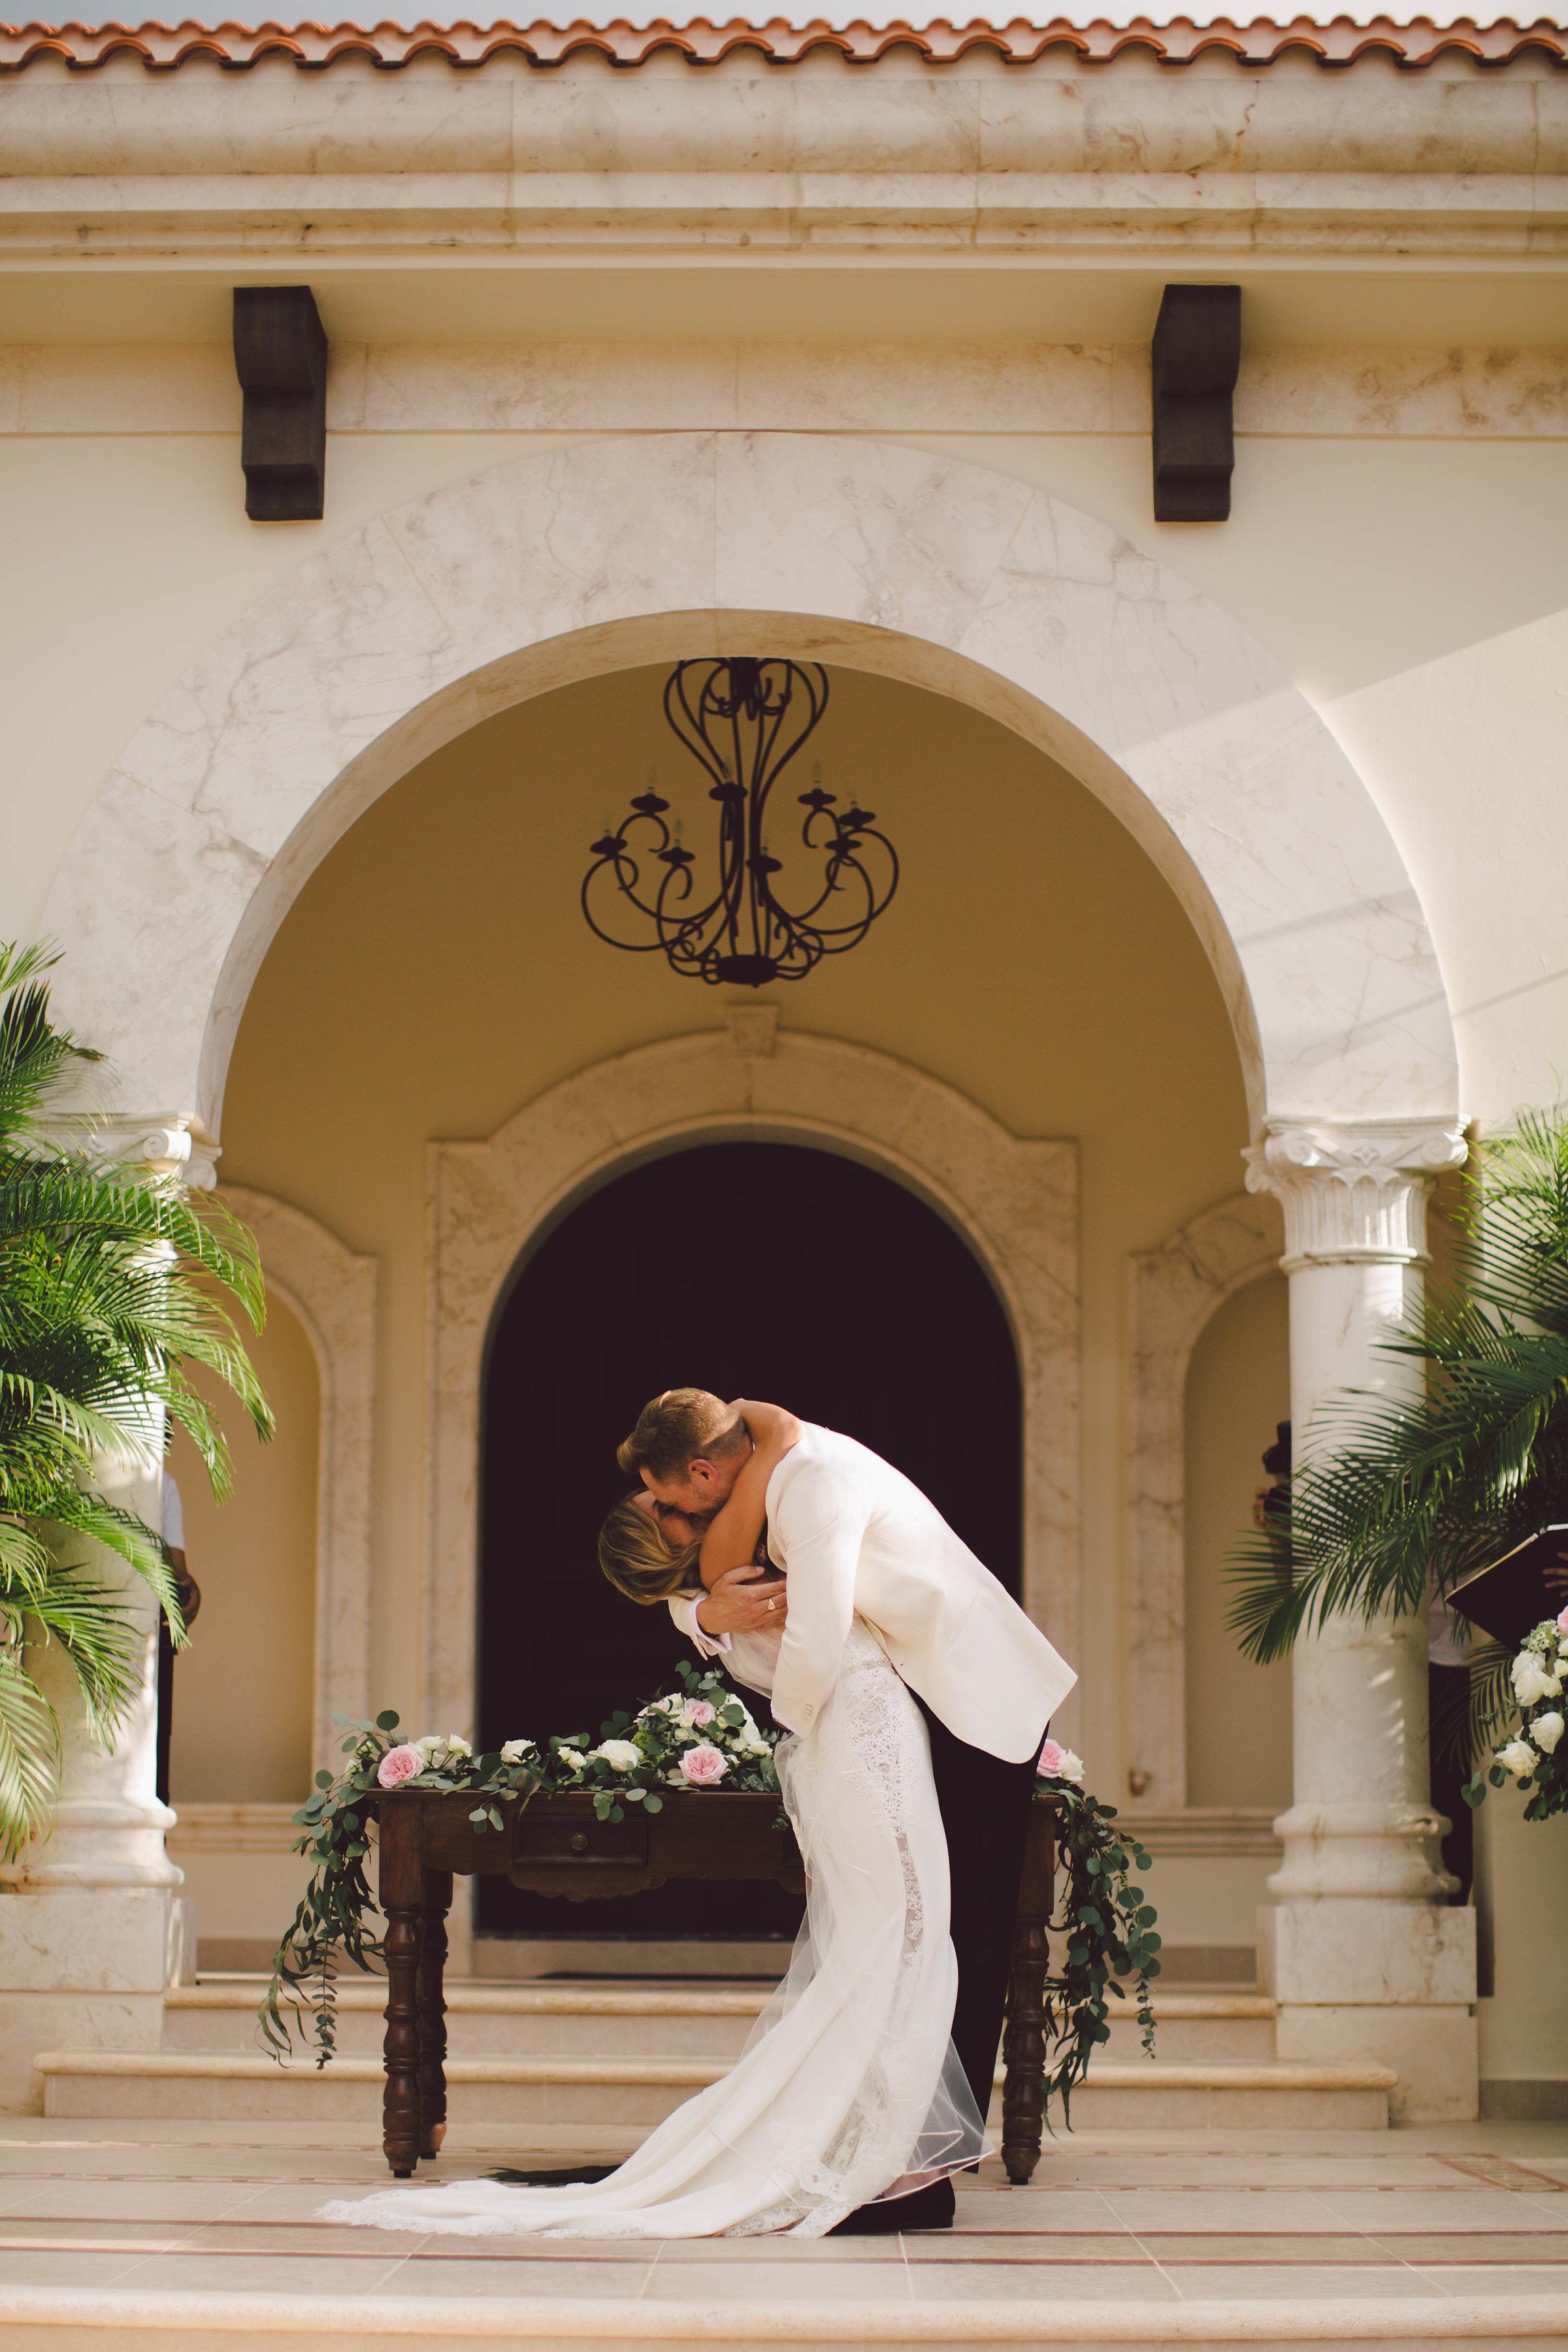 mexico_wedding_cancun_villa_la_joya_evangeline_lane_065.jpg